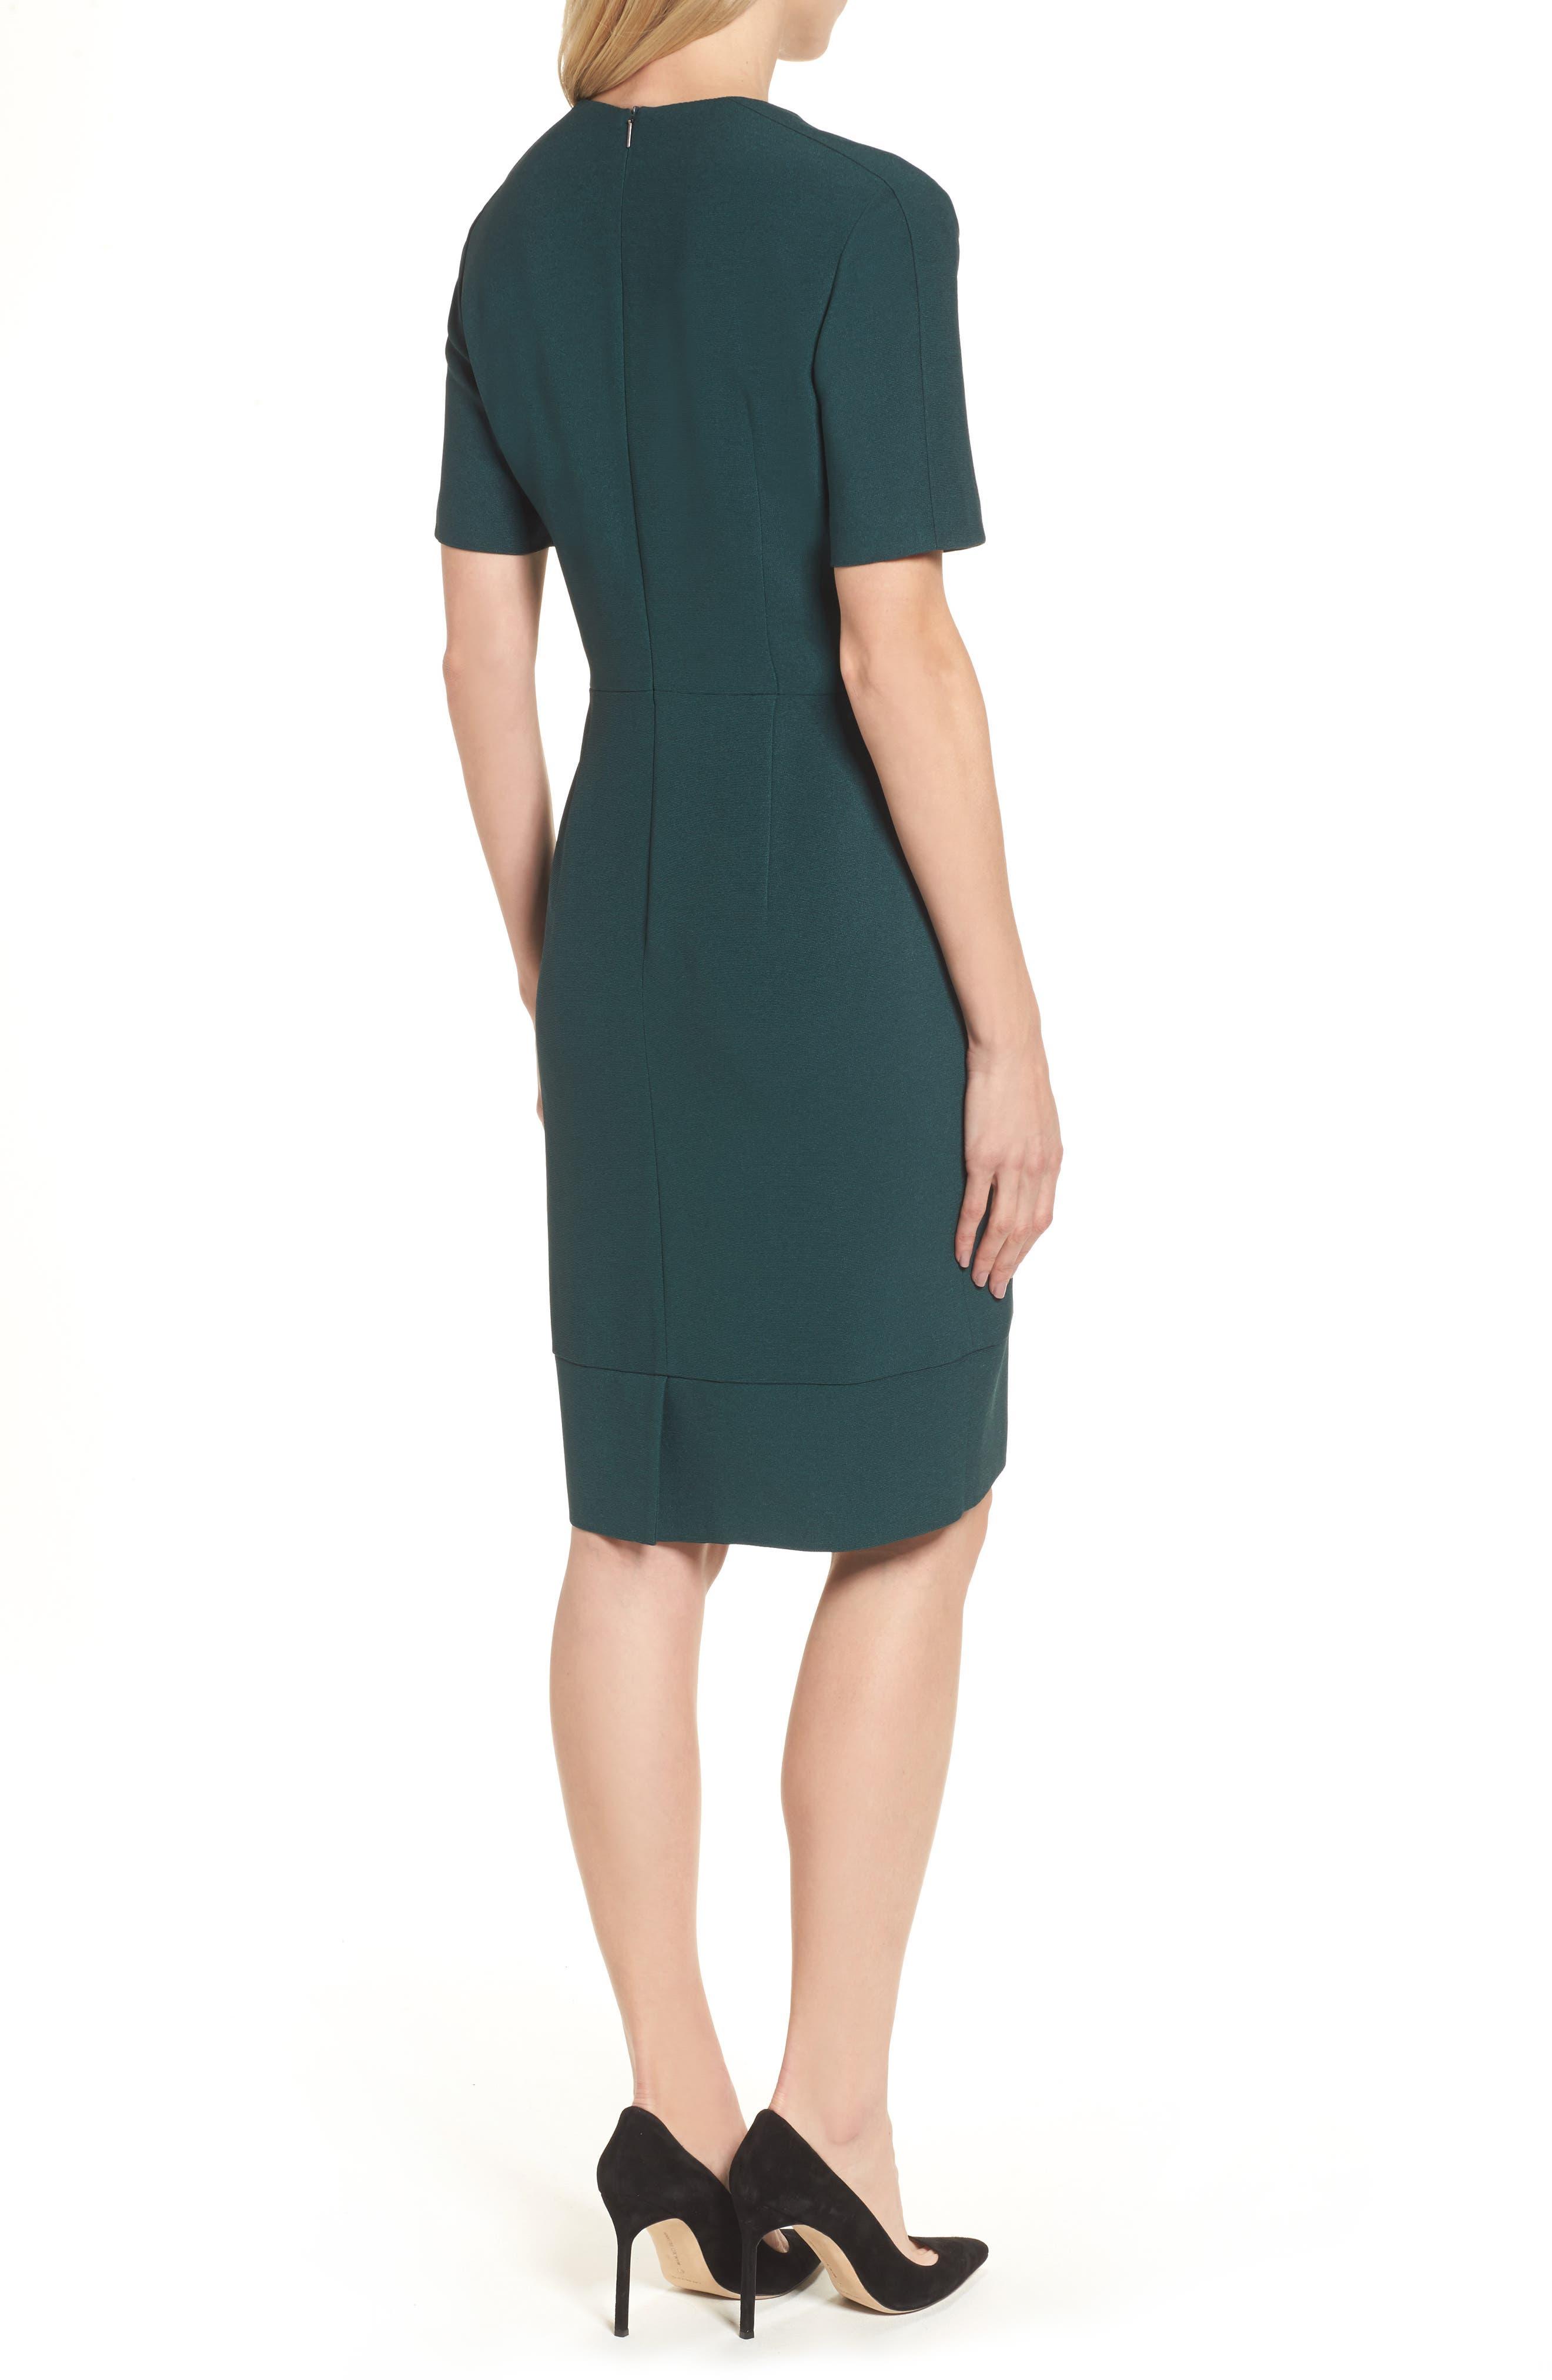 Dalesana Sheath Dress,                             Alternate thumbnail 2, color,                             301